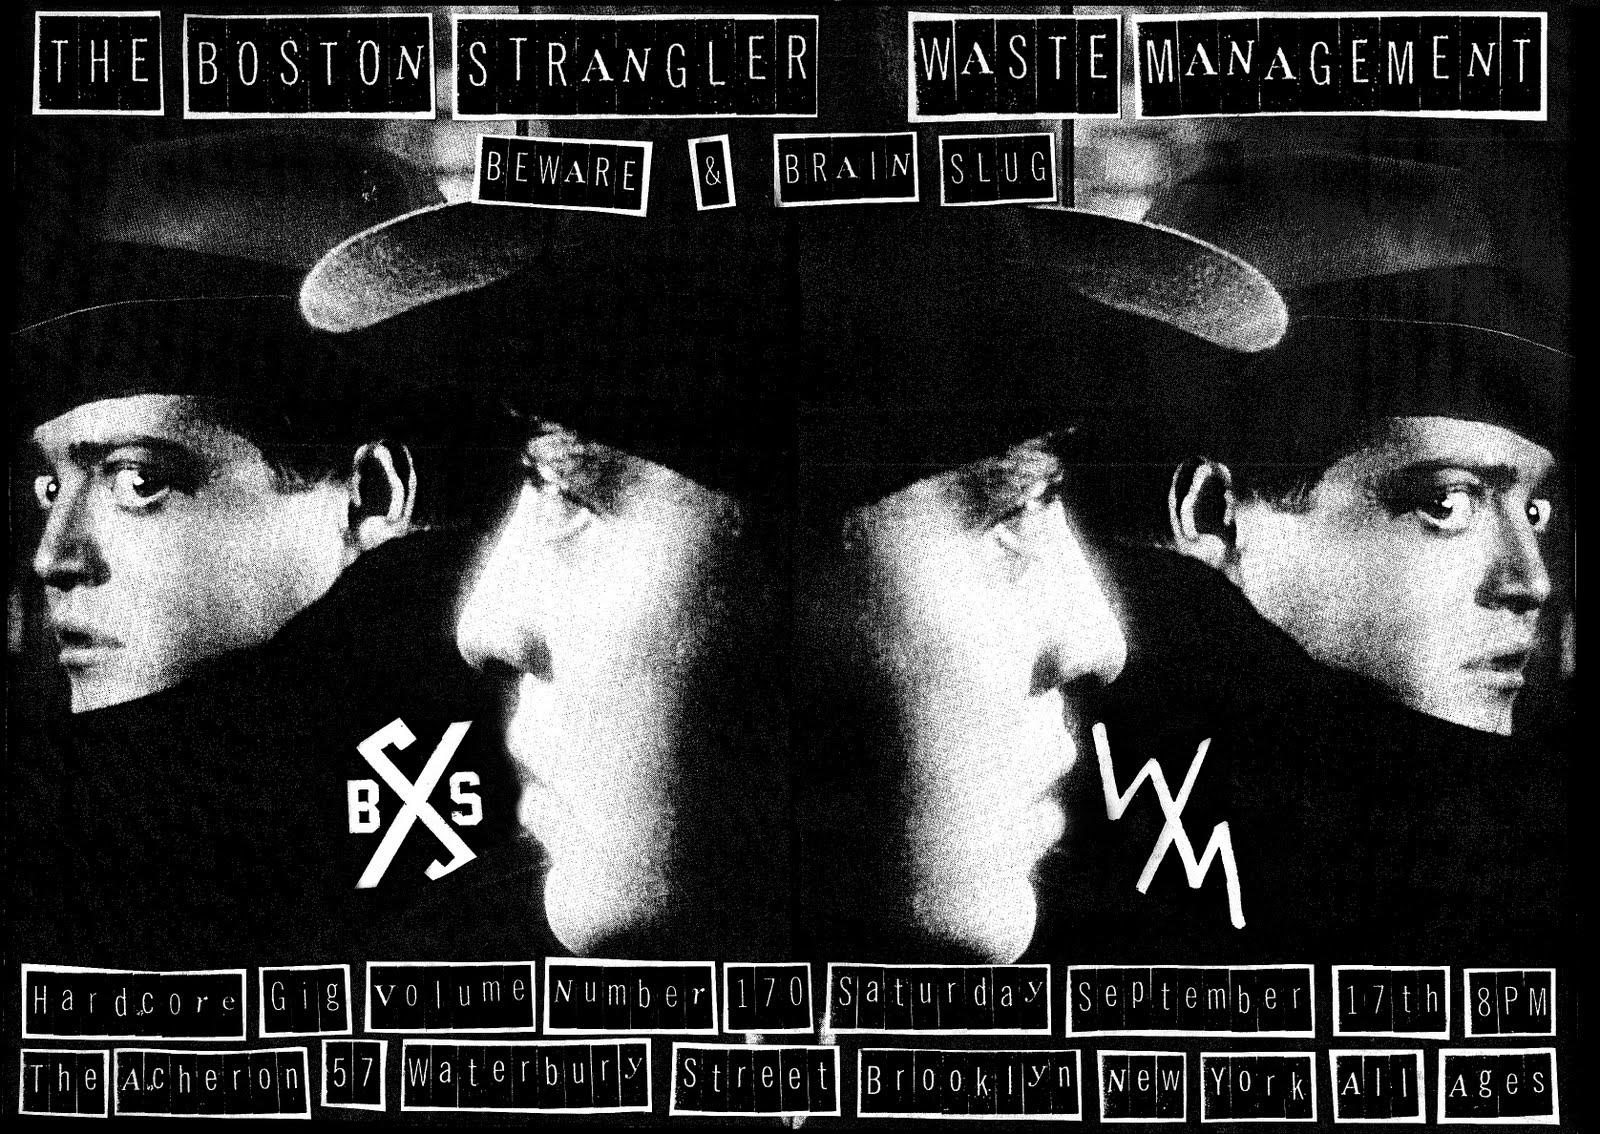 Boston Strangler-Waste Management-Beware-Brain Slug @ The Archeron Brooklyn NY 9-17-11